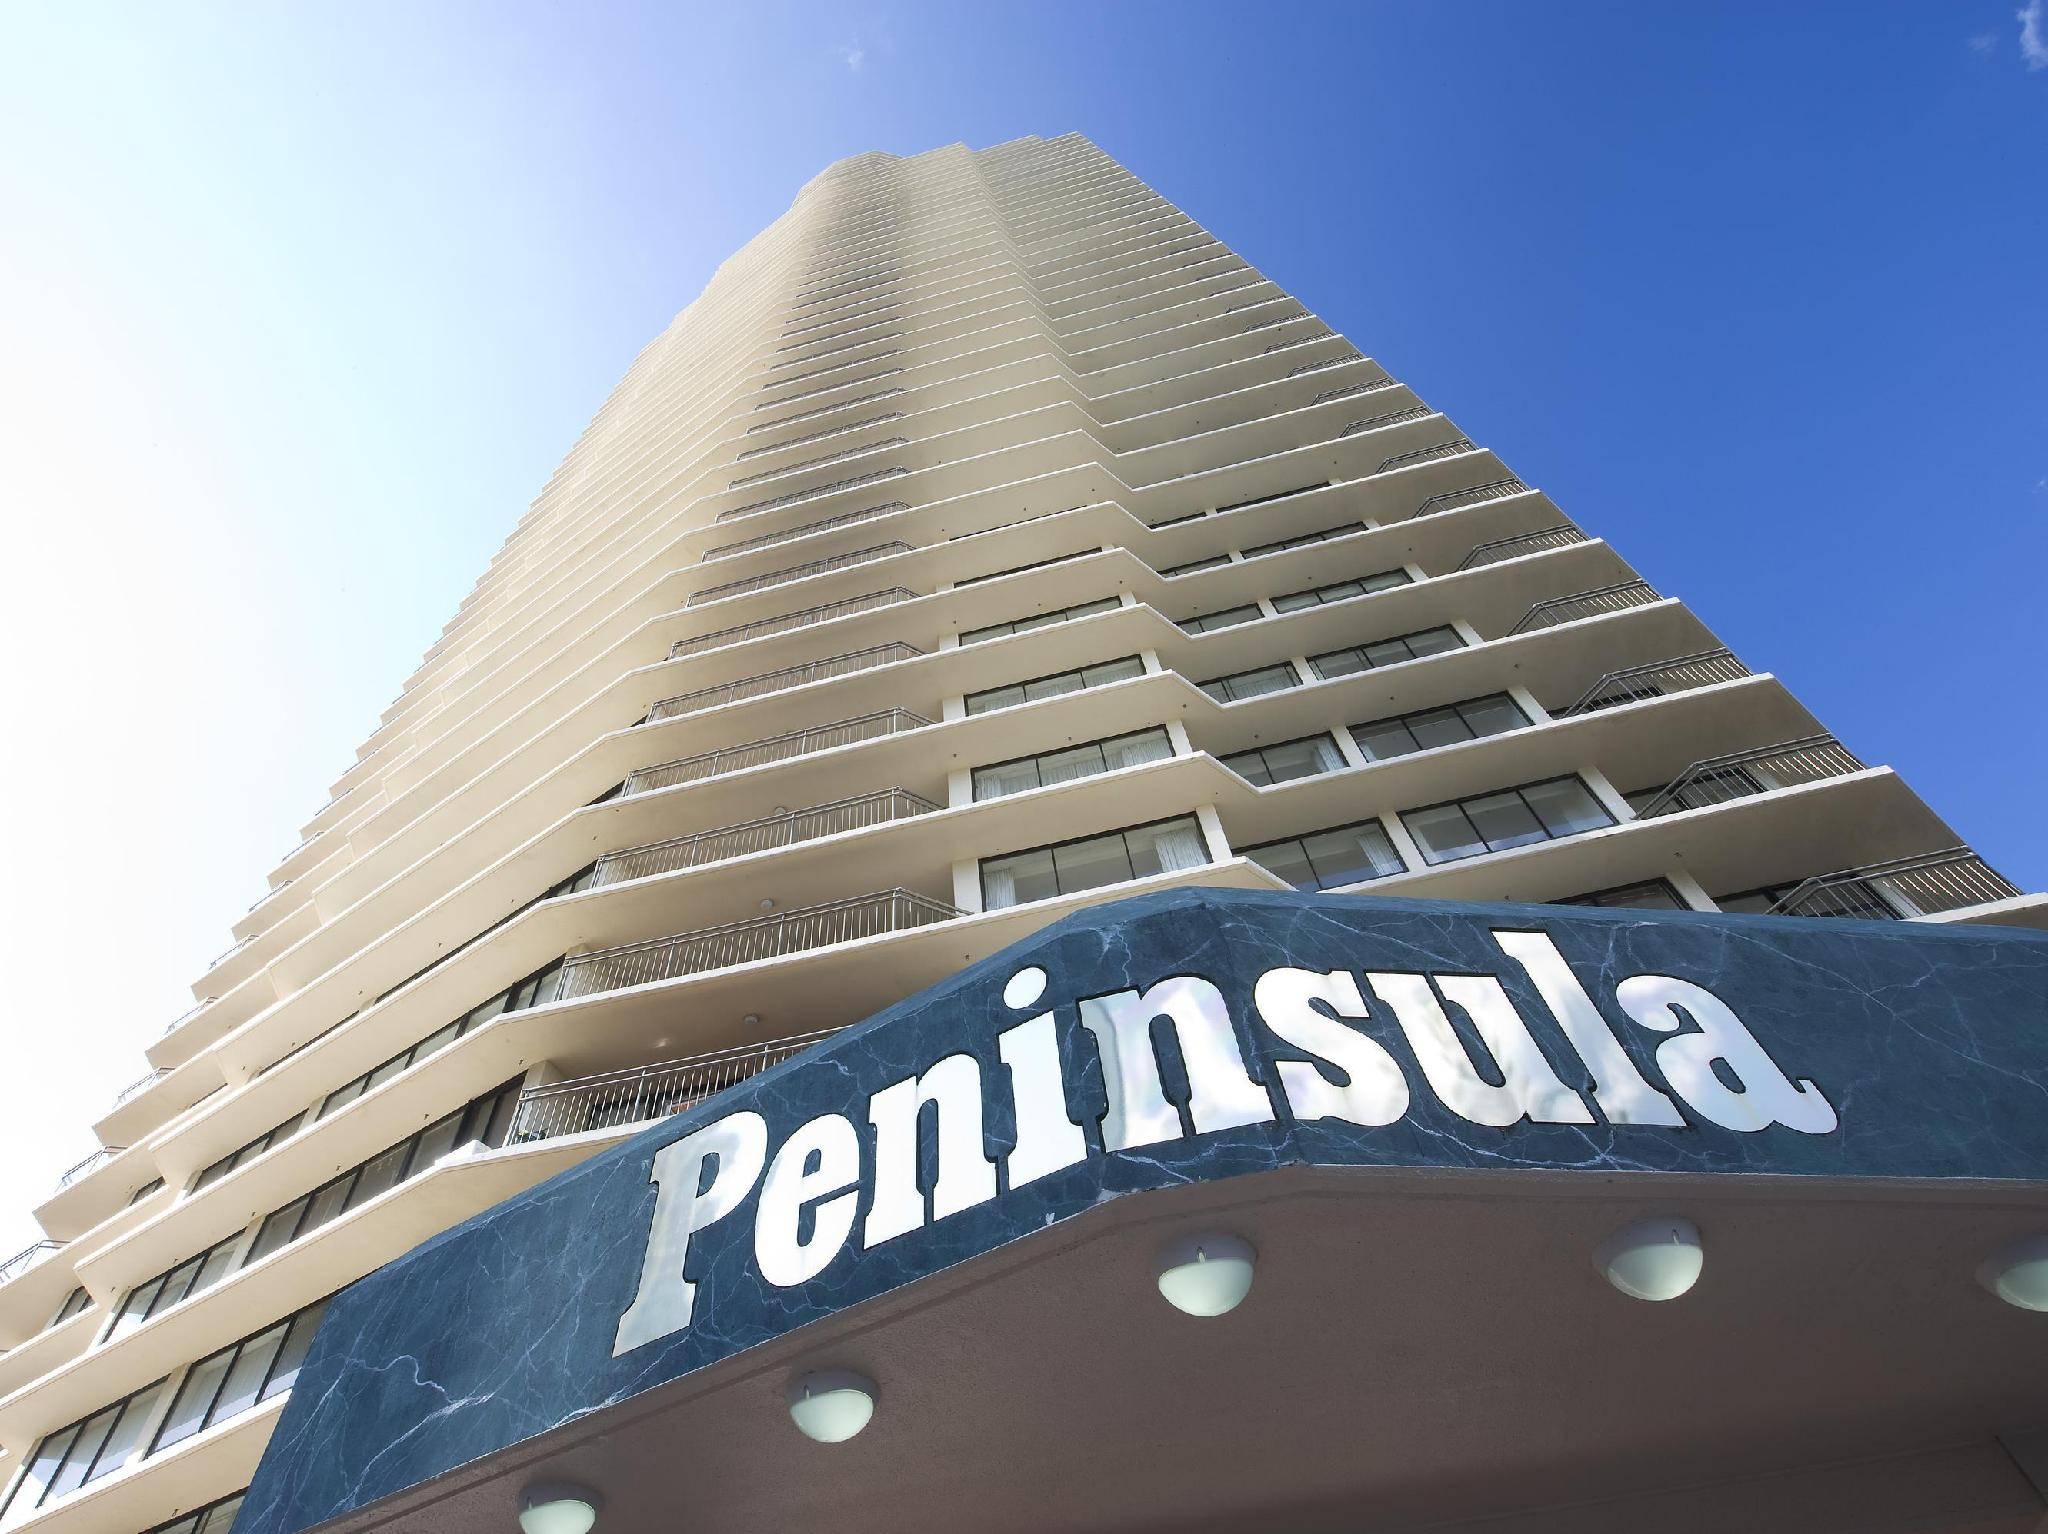 Breakfree Peninsula Apartments - Hotell och Boende i Australien , Guldkusten